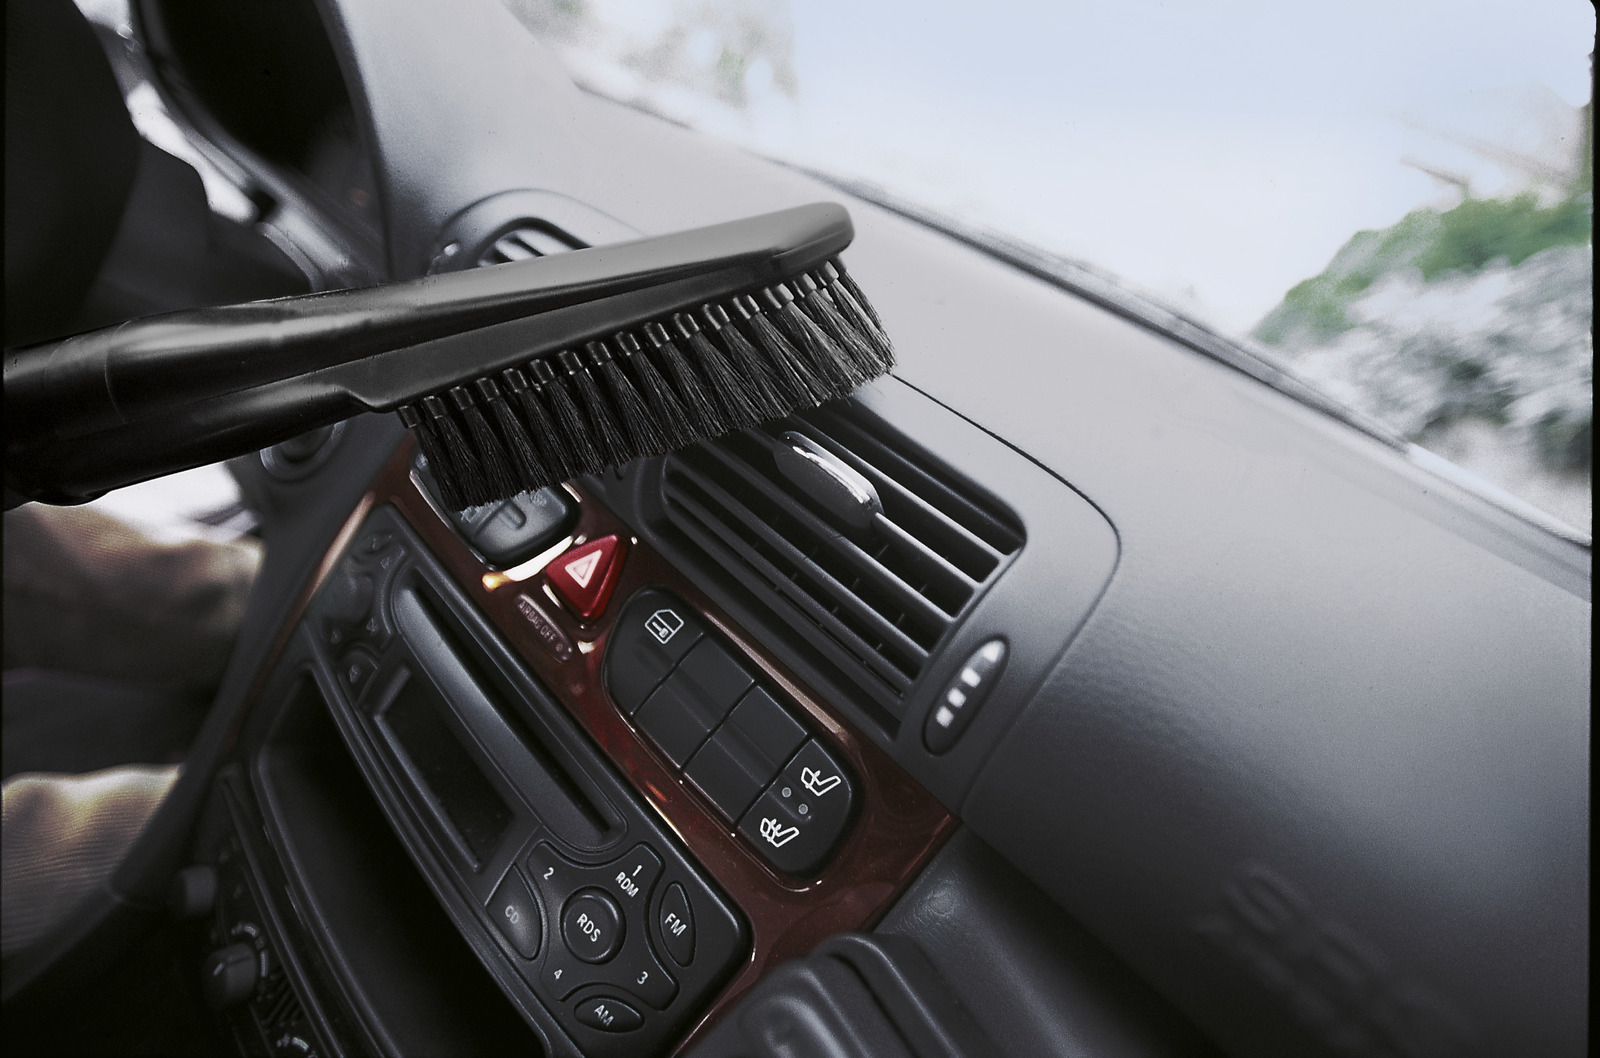 Car Interior Cleaning Kit Karcher Australia